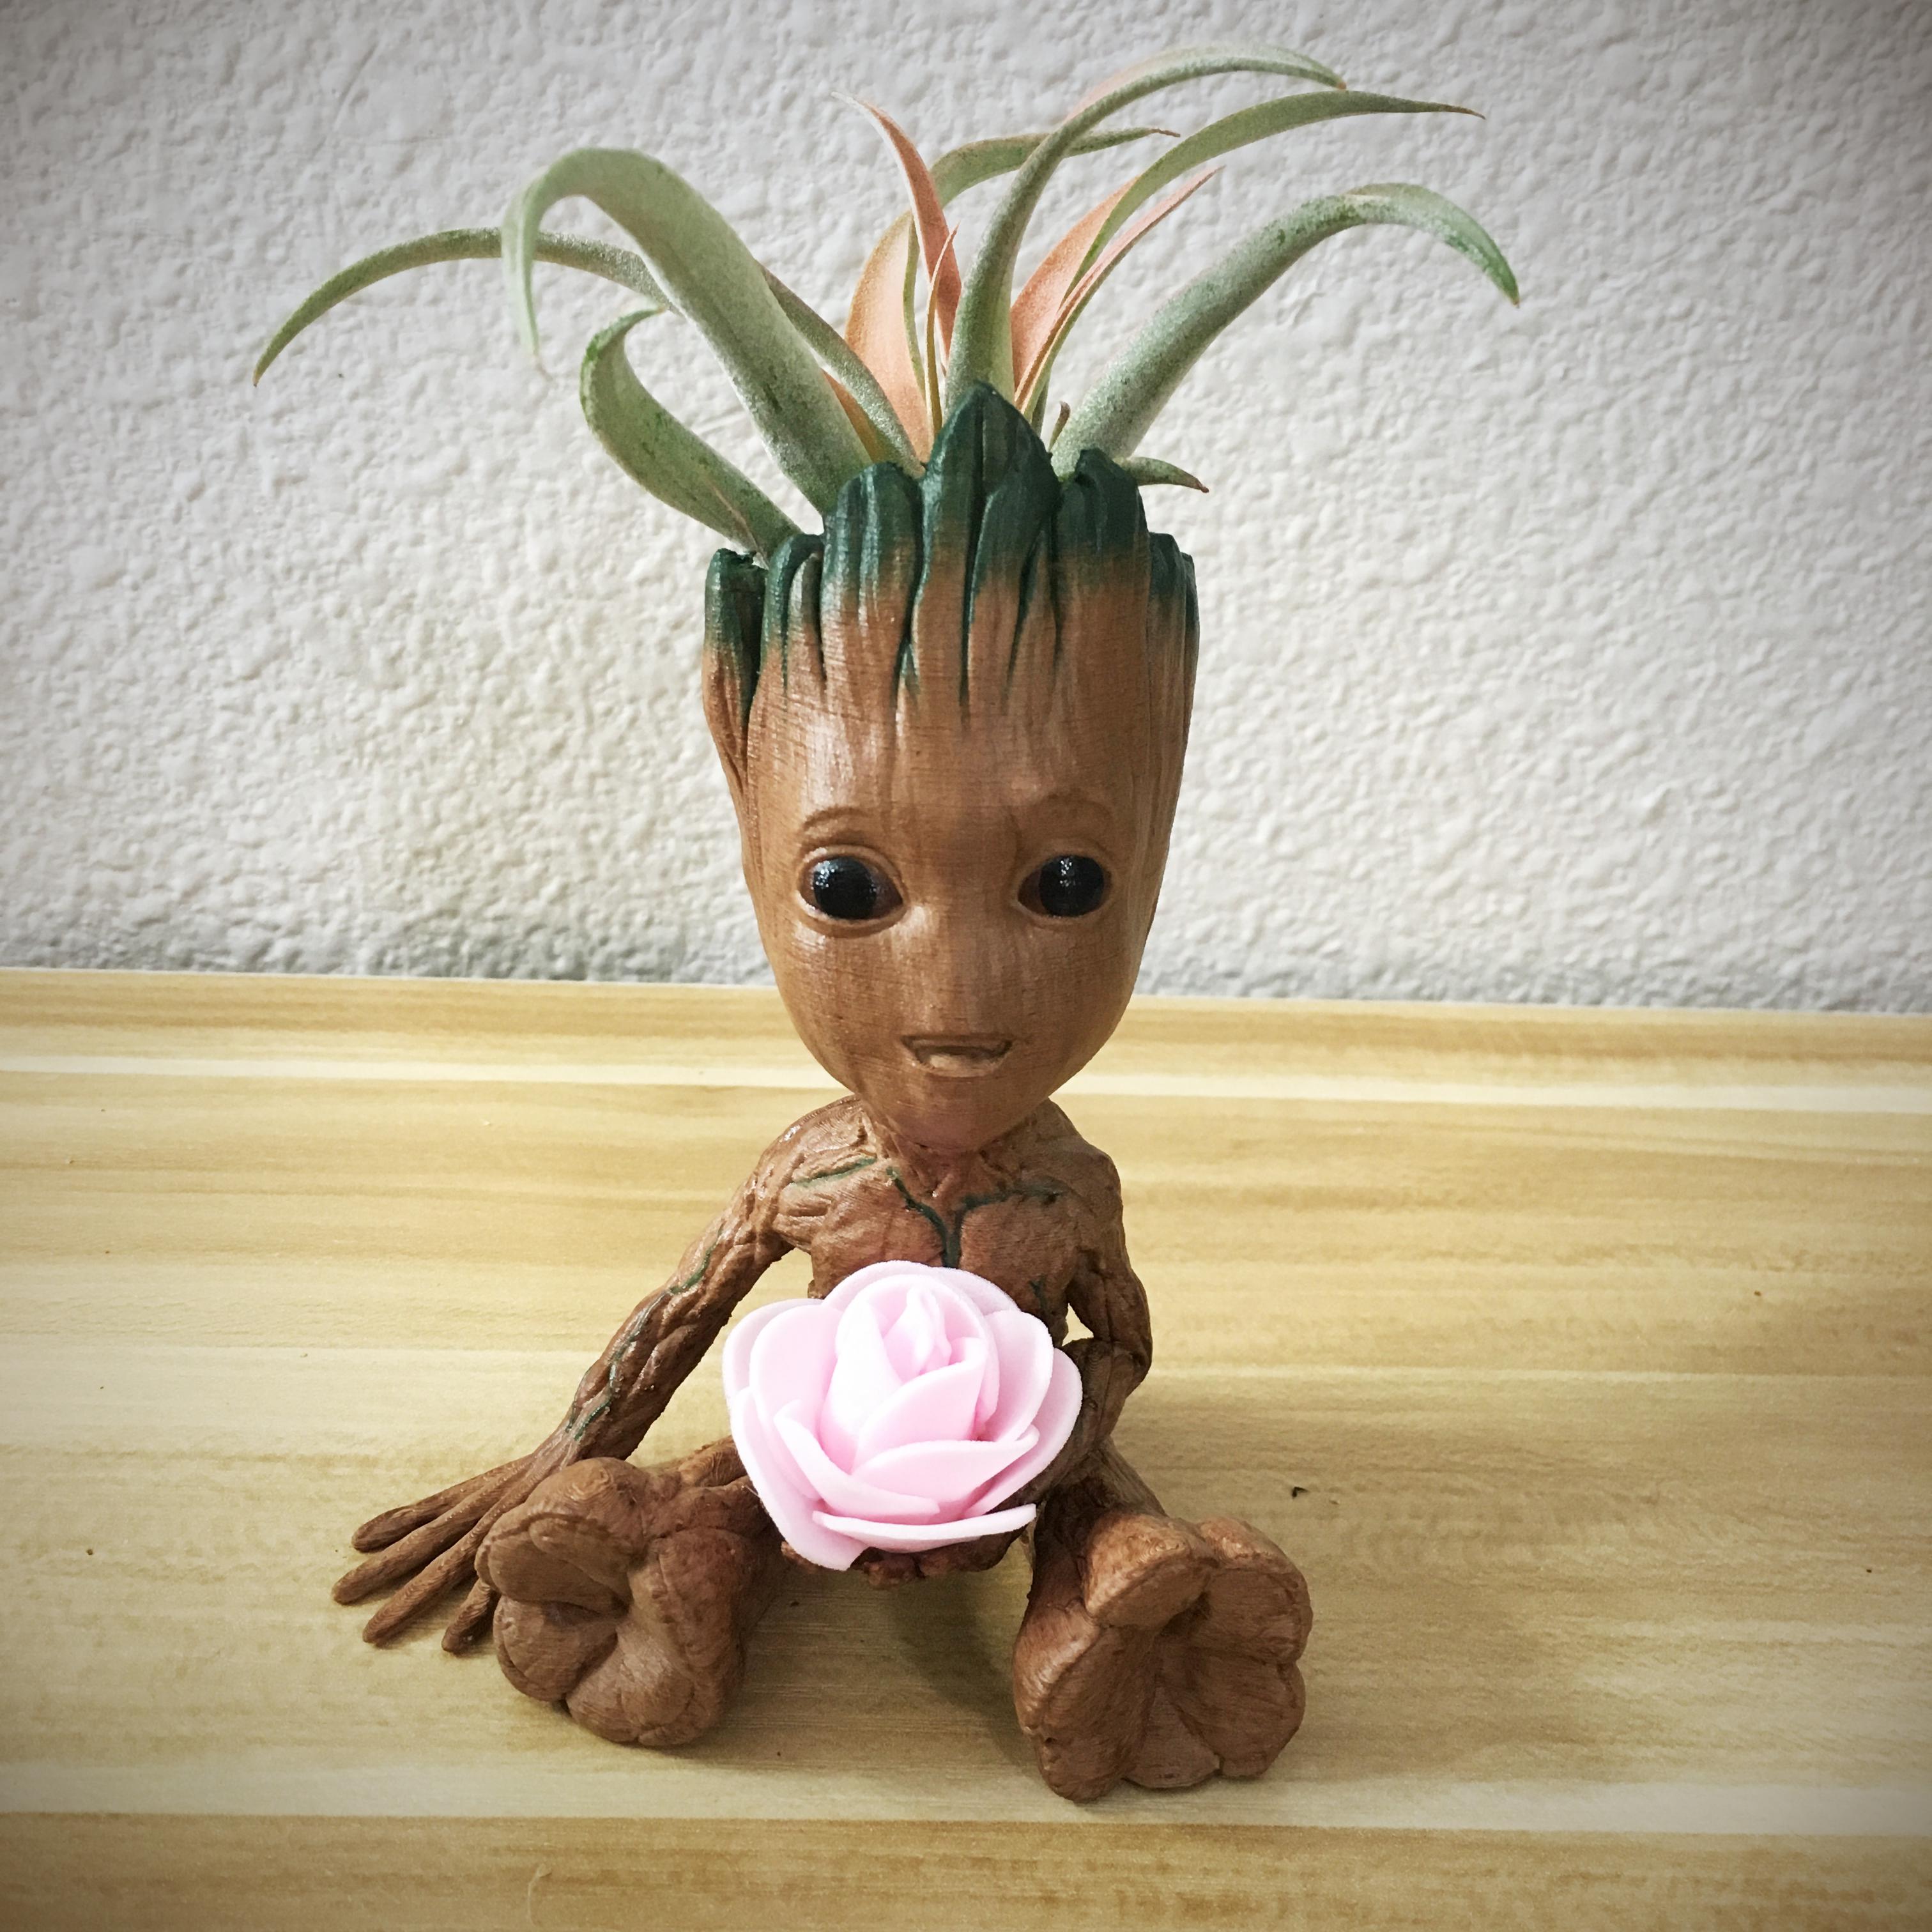 Cute Tree planter w/ flower plant03